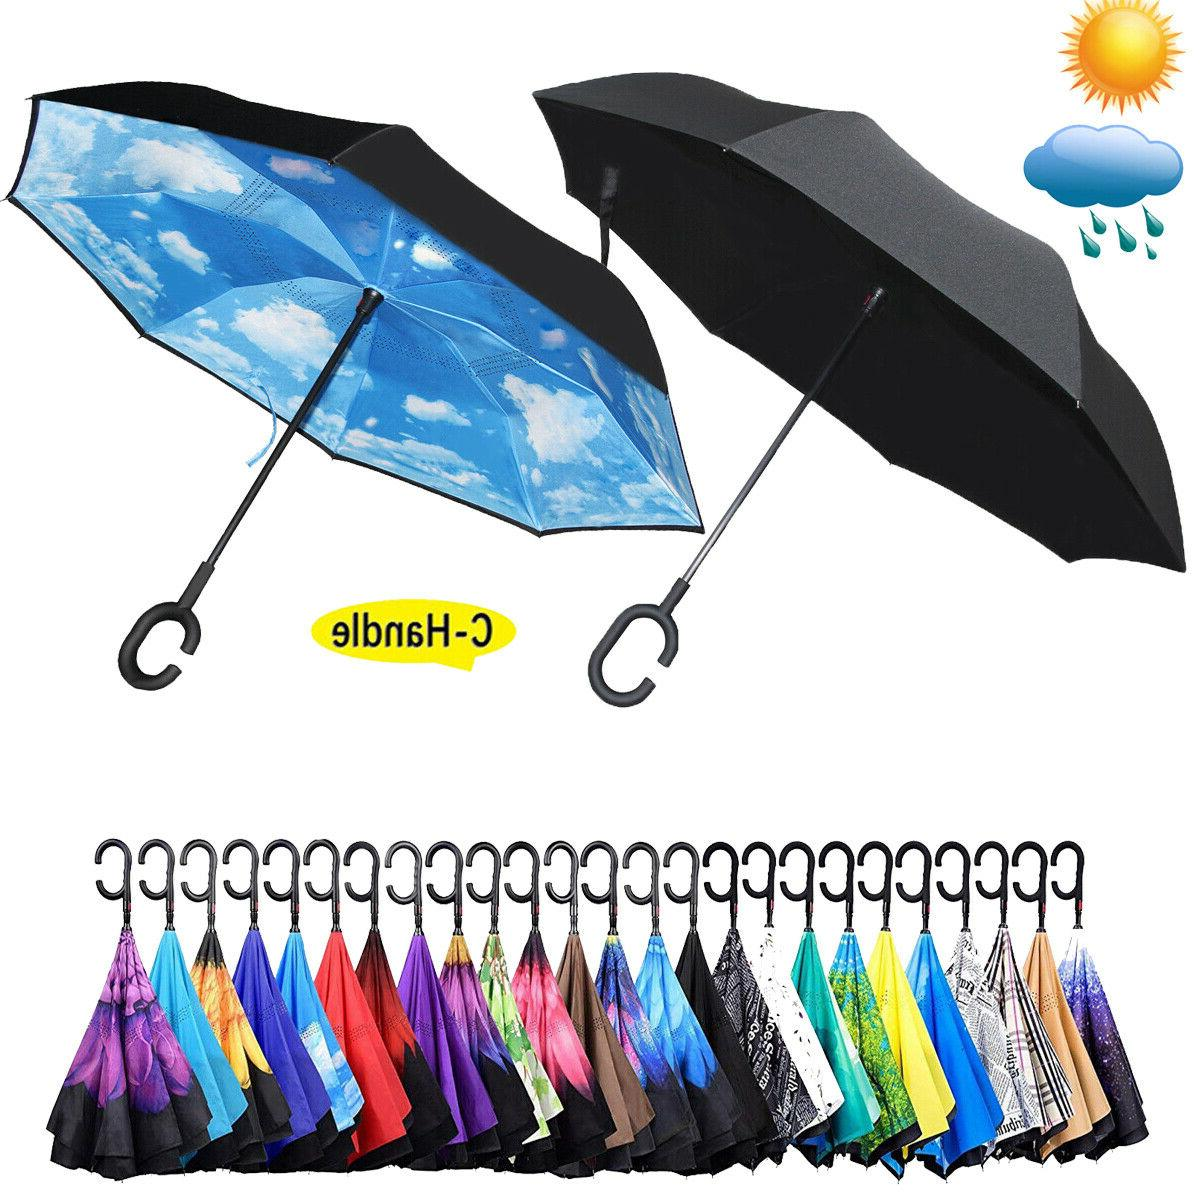 c handle reverse umbrella double layer upside